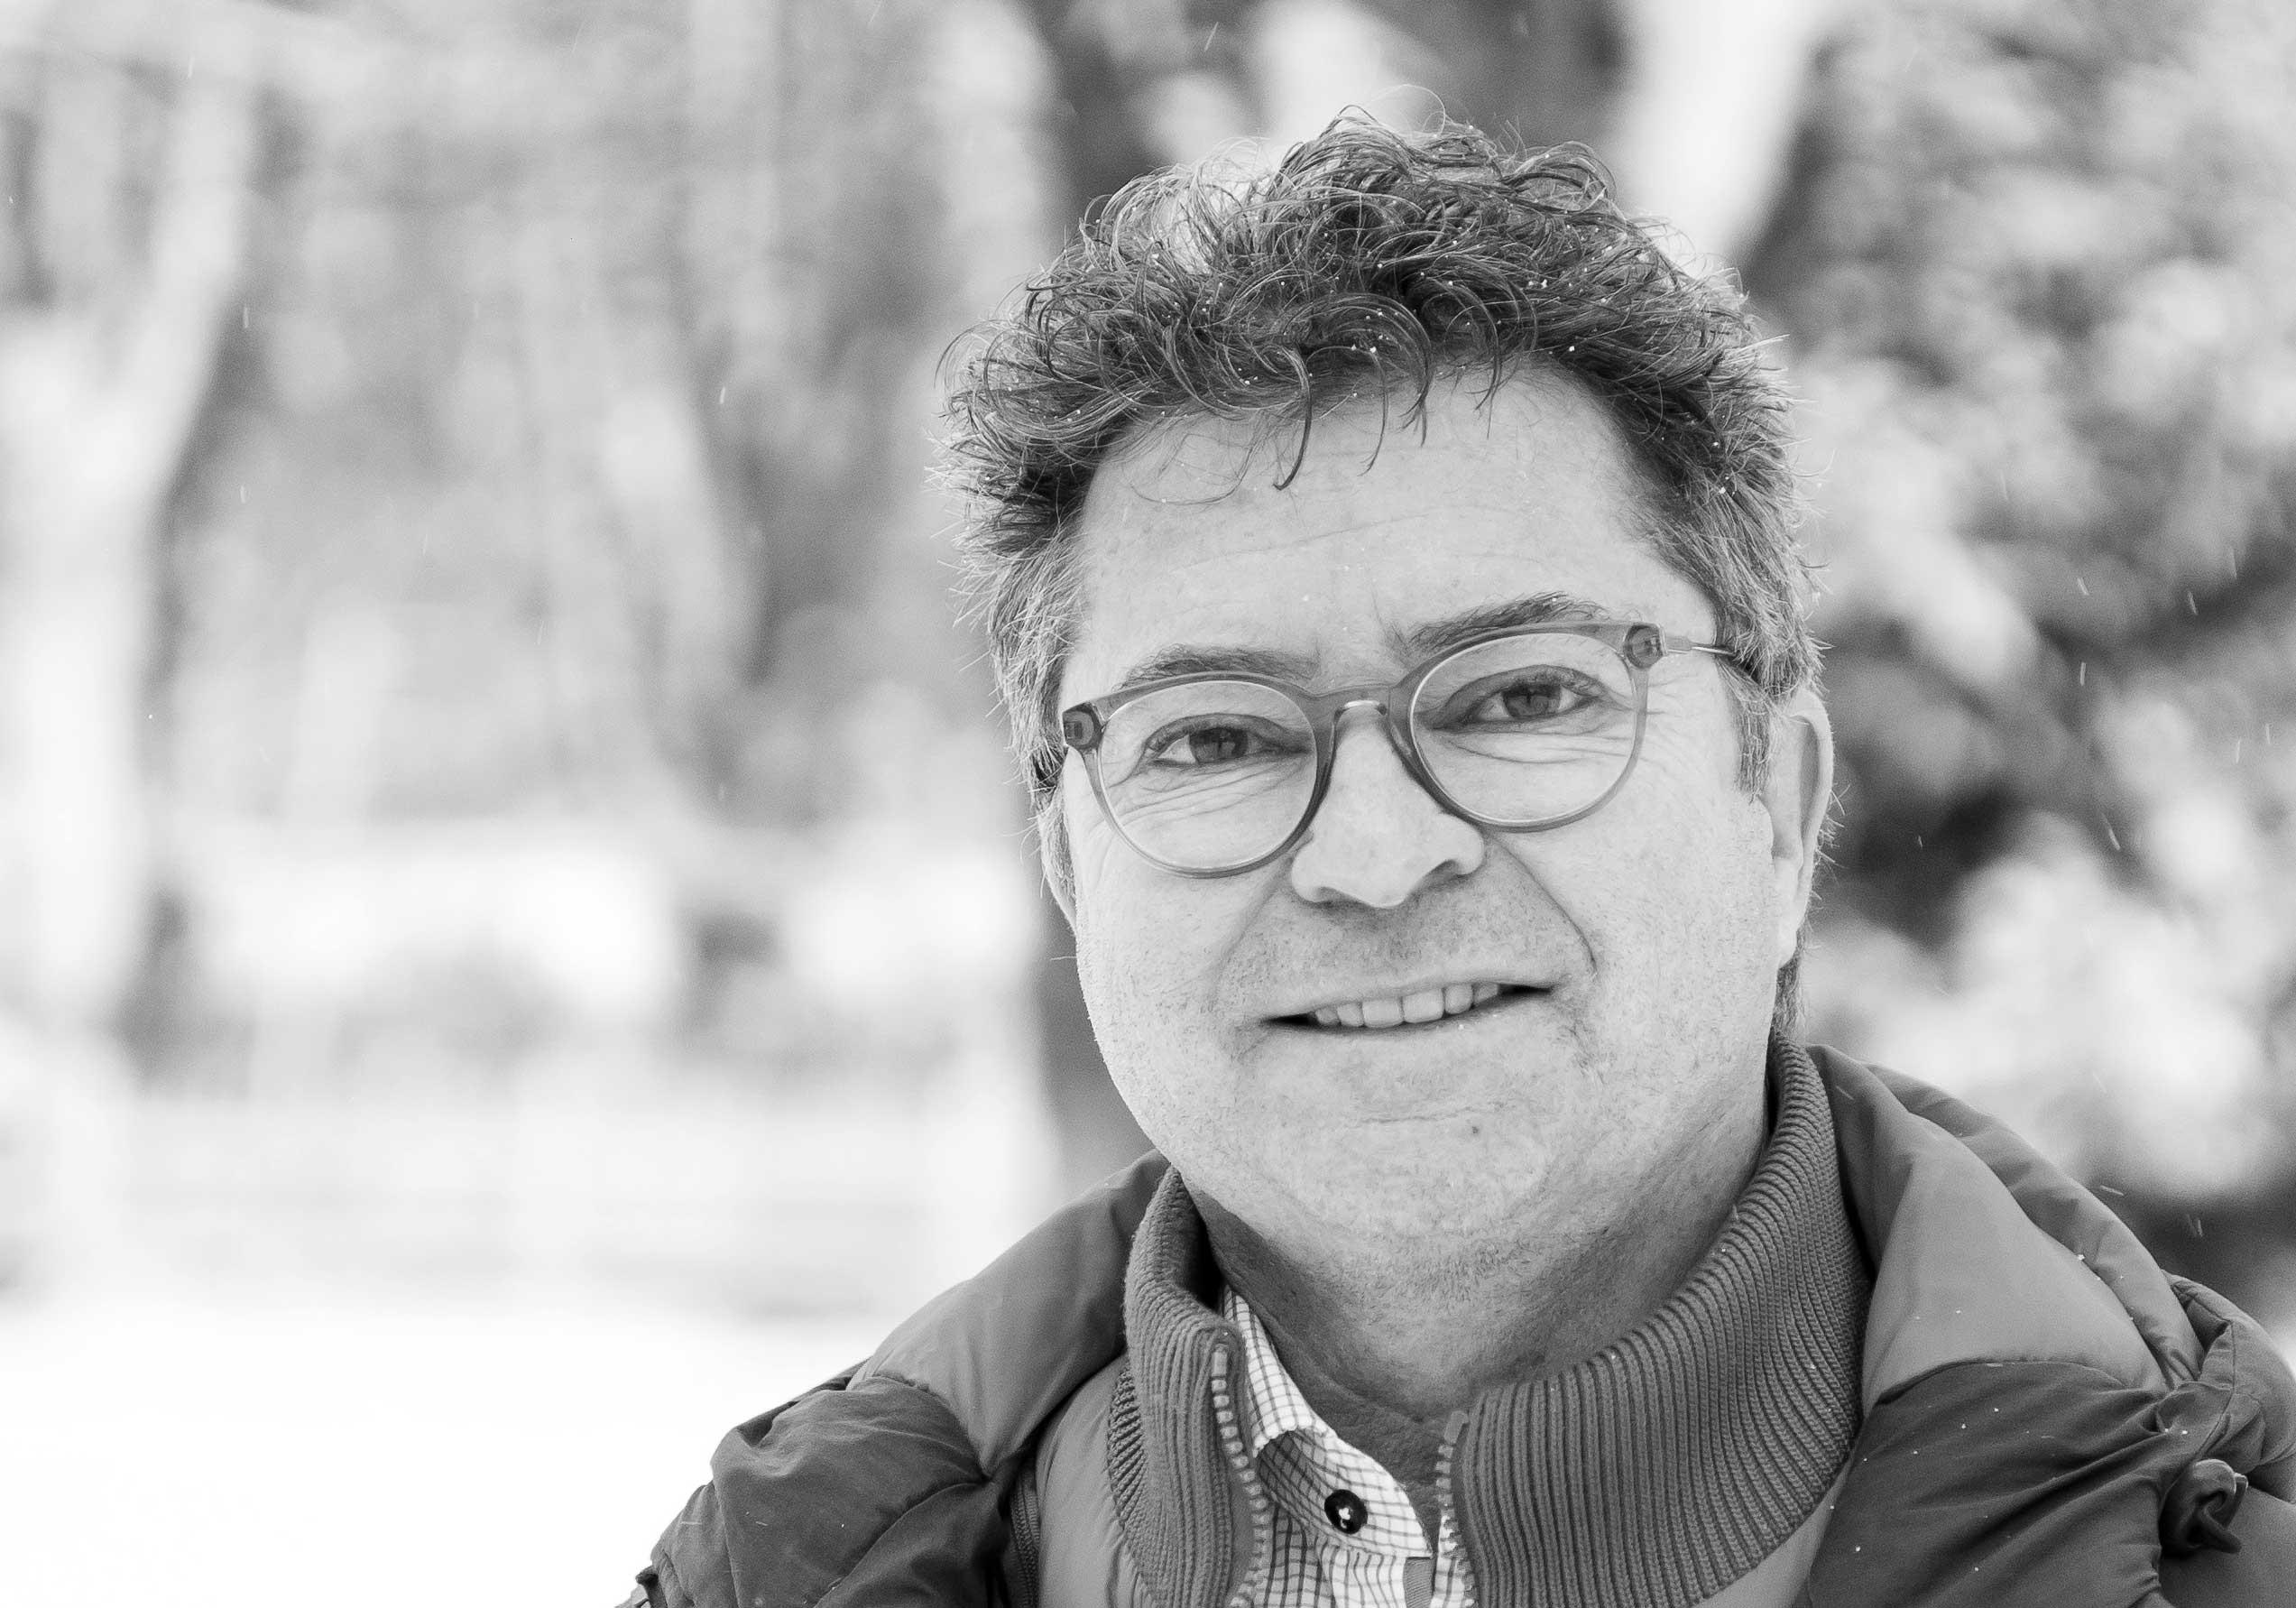 Stefan Eichenholz